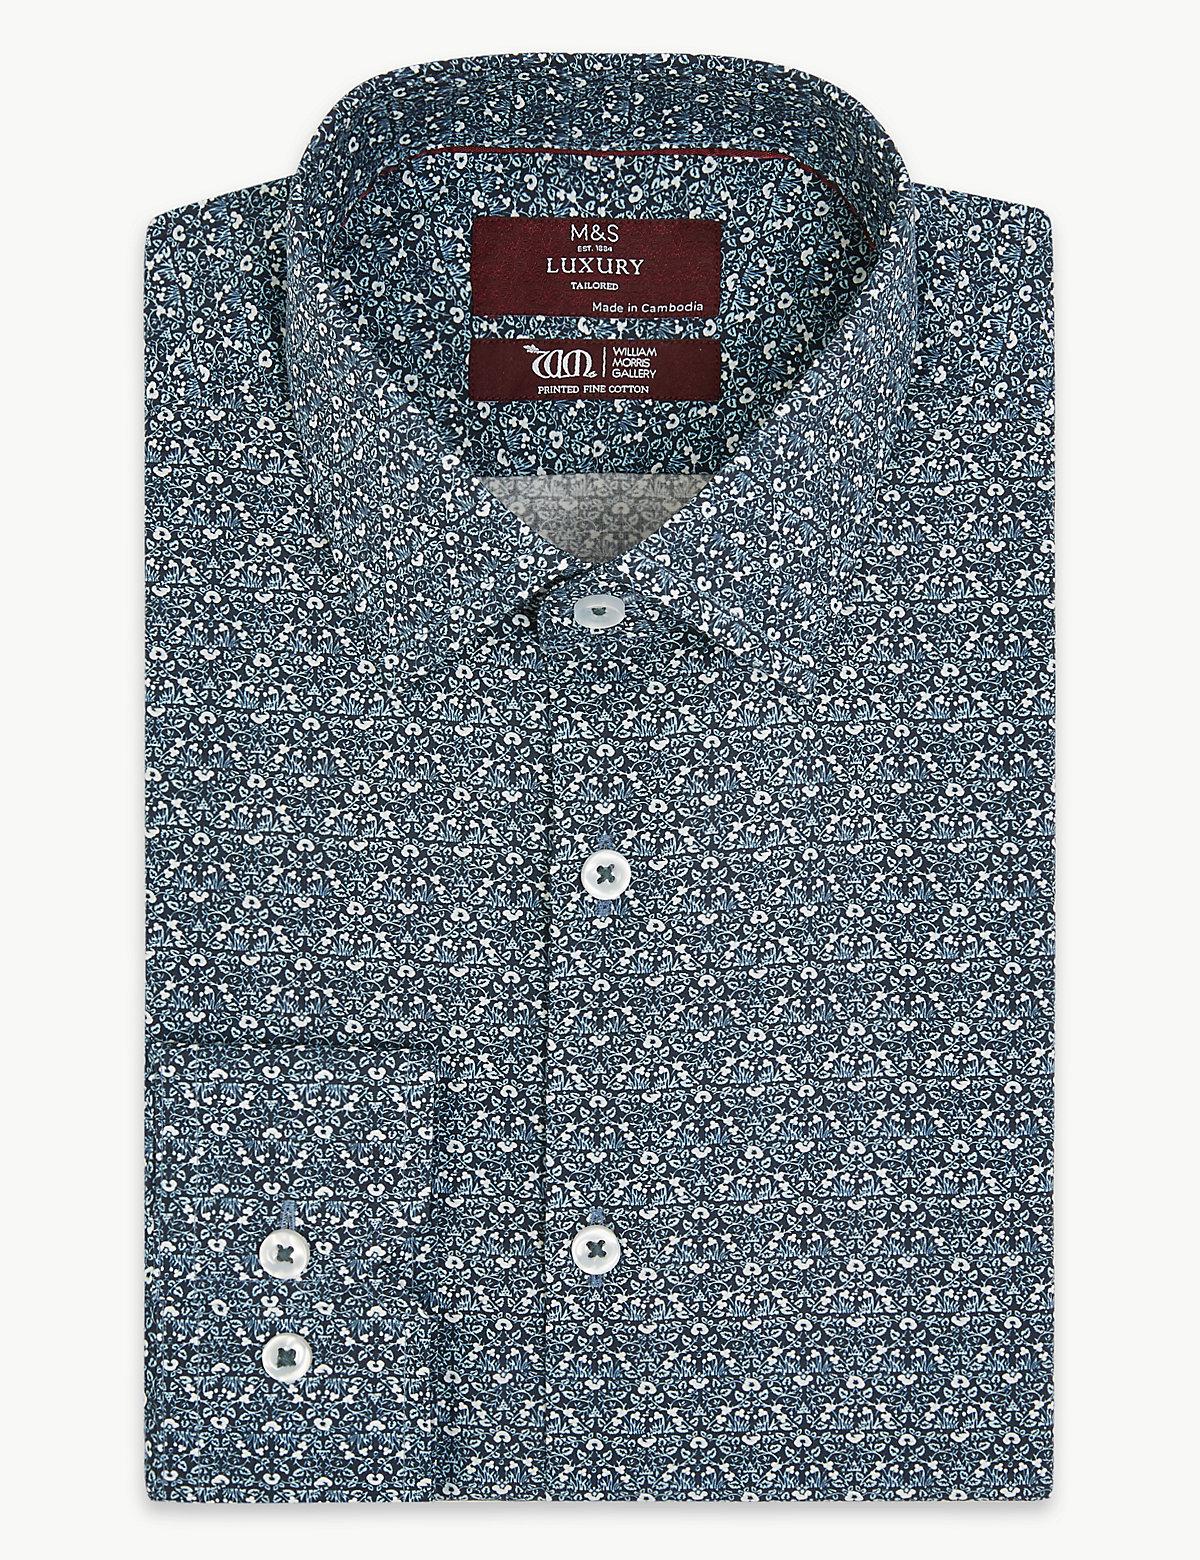 Рубашка с принтом от Уильяма Морриса